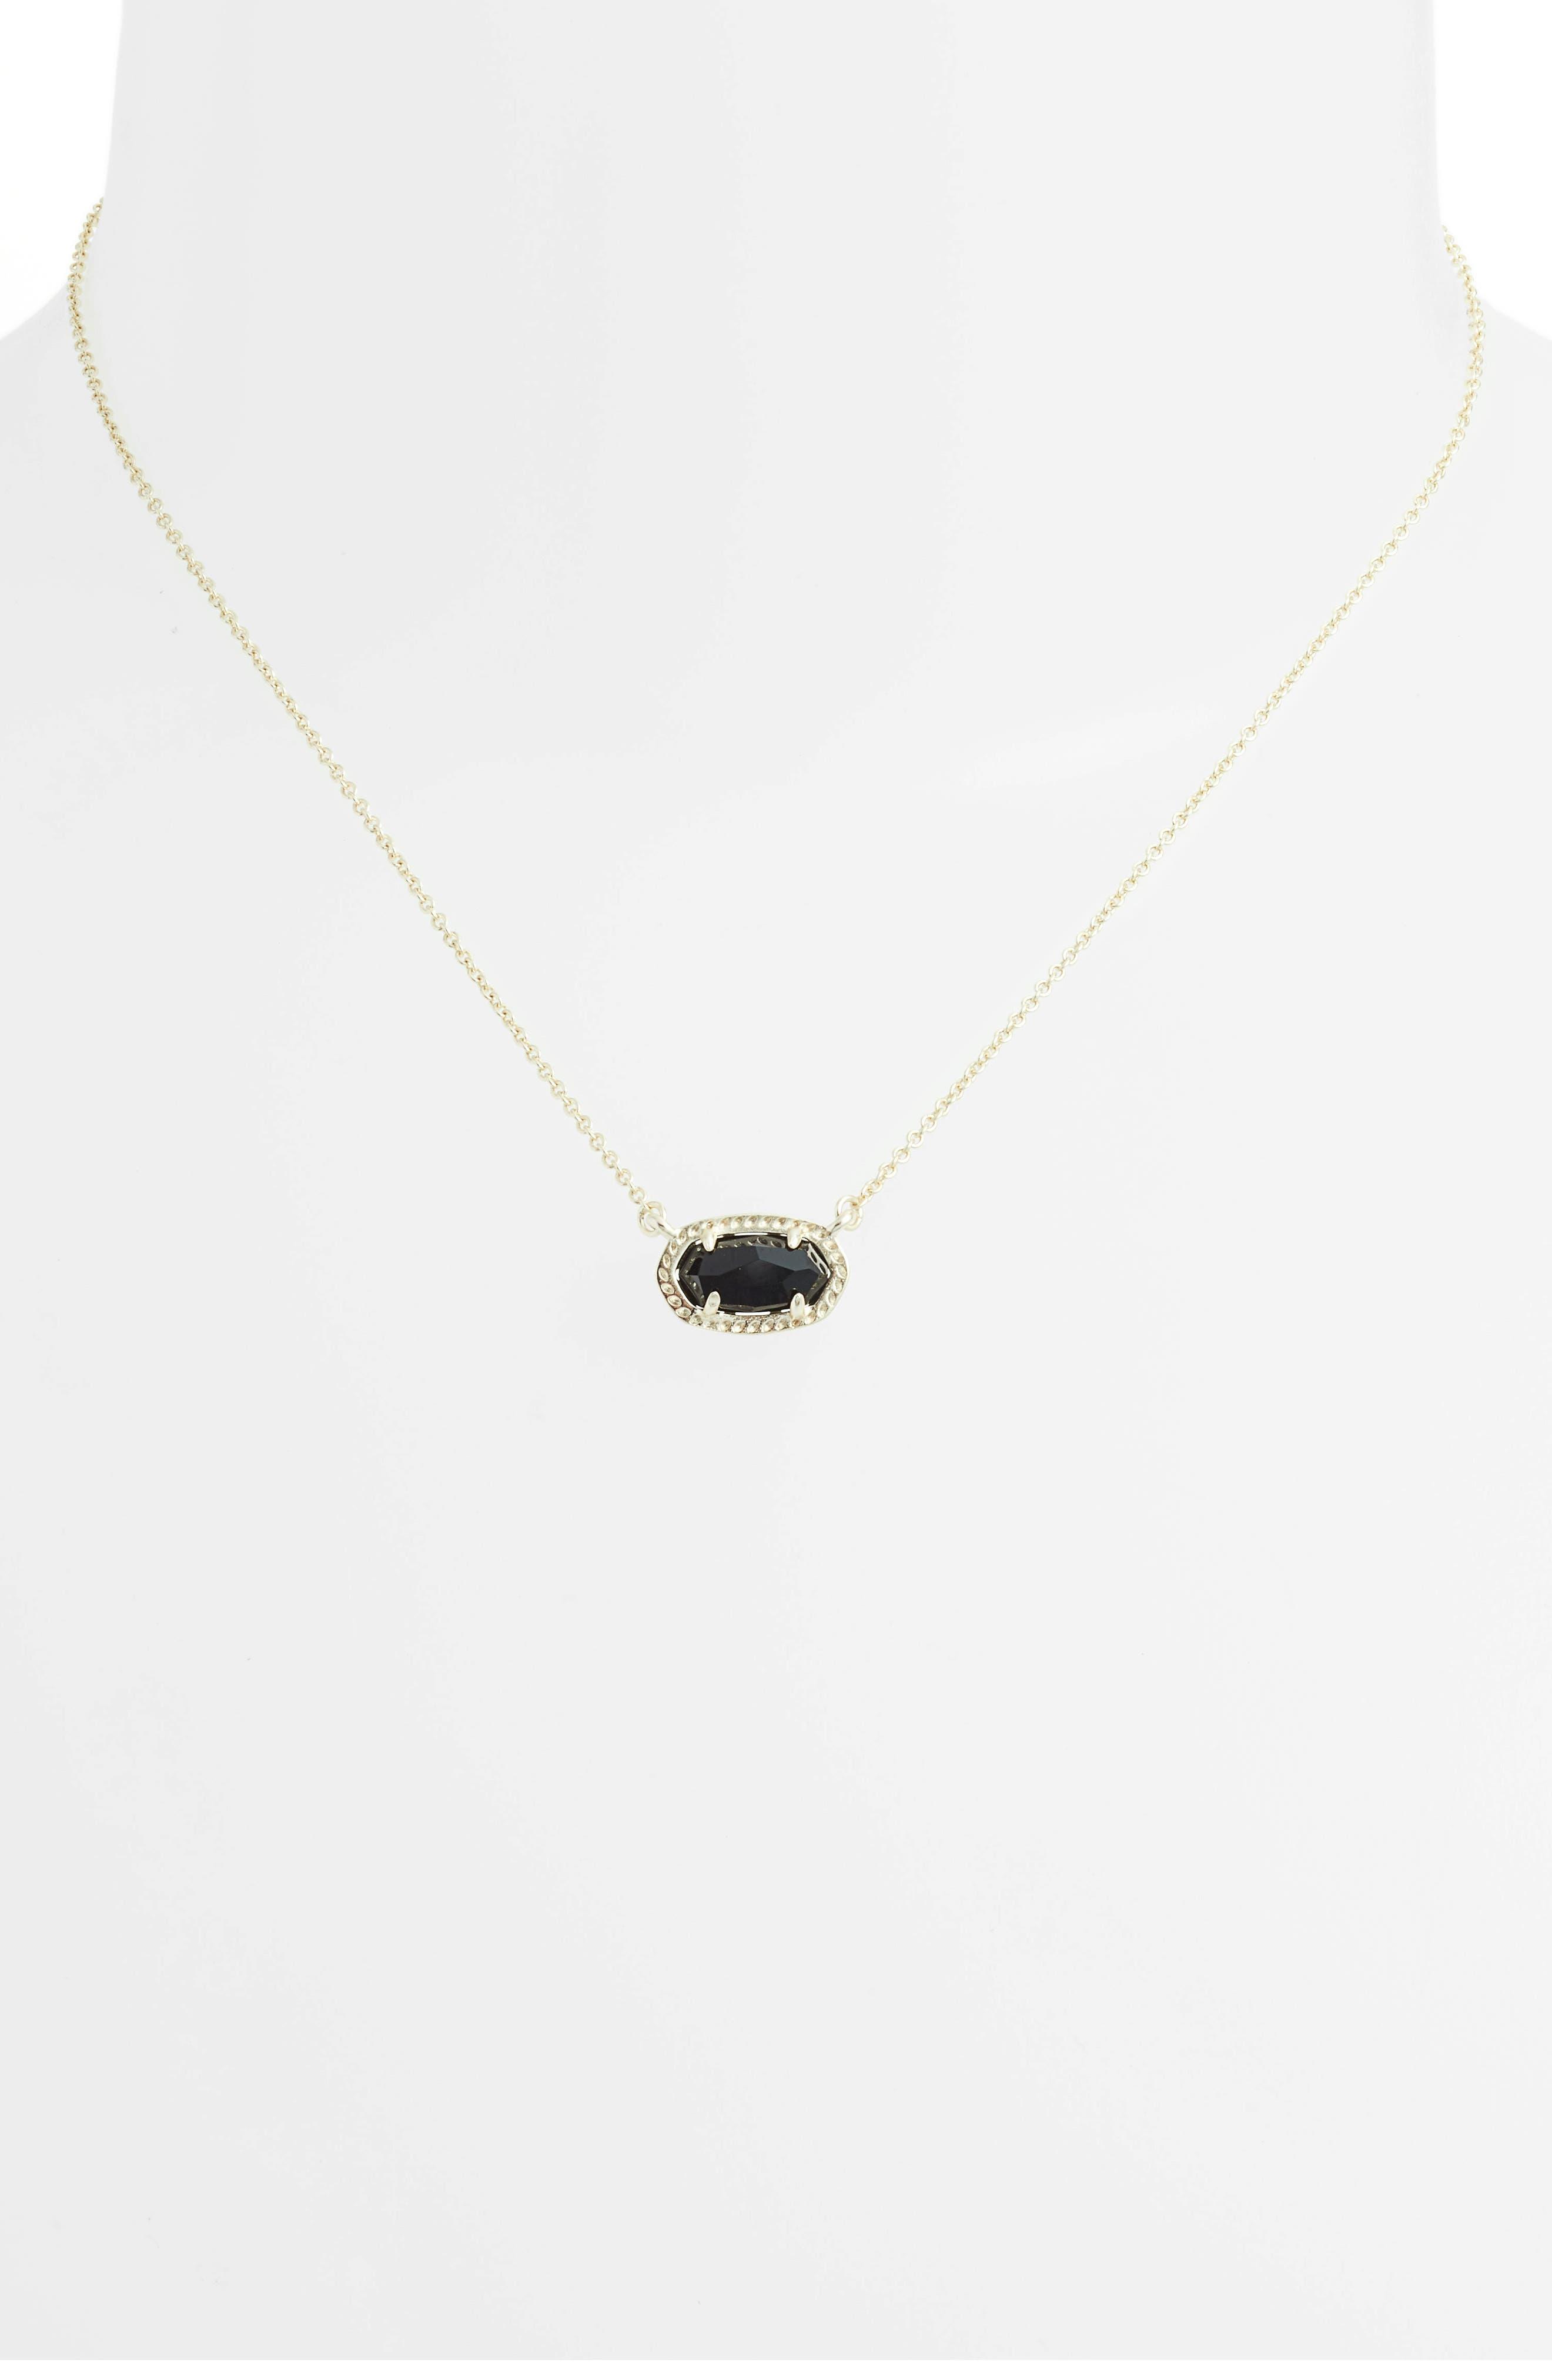 Ember Pendant Necklace,                             Alternate thumbnail 2, color,                             BLACK/ GOLD